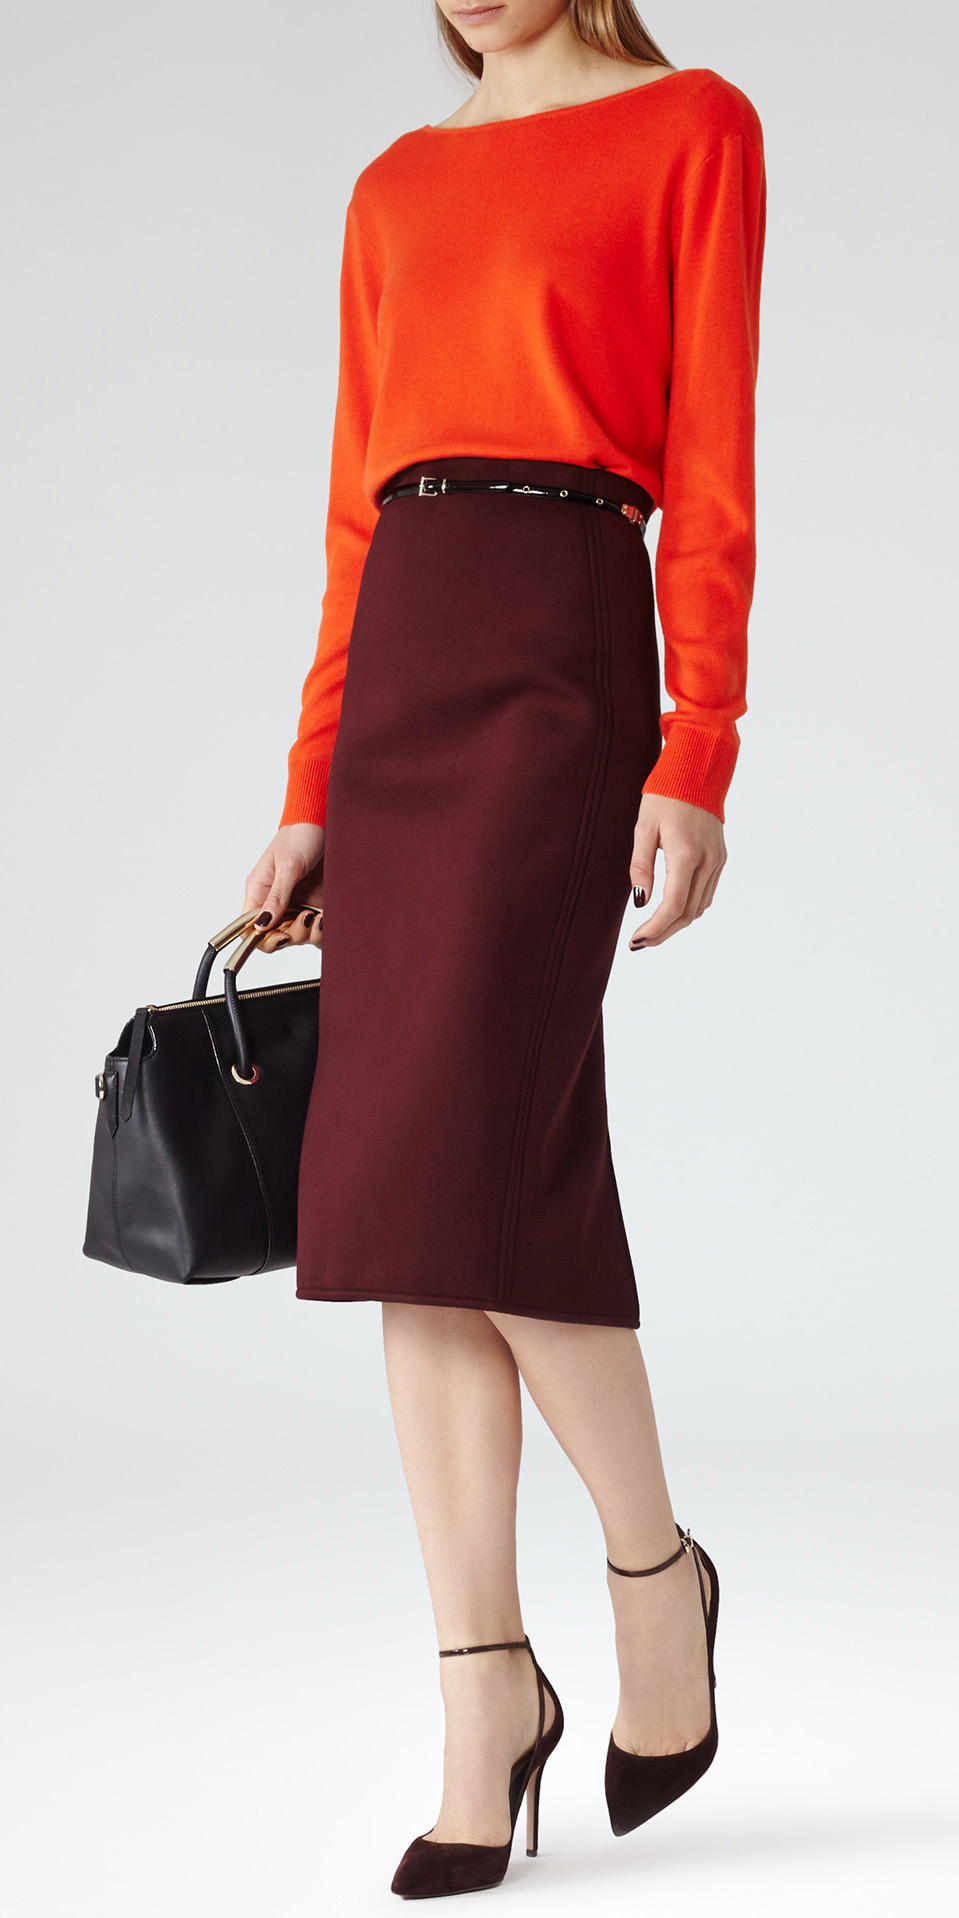 burgundy-pencil-skirt-orange-sweater-skinny-belt-black-bag-black-shoe-pumps-fall-winter-work.jpeg